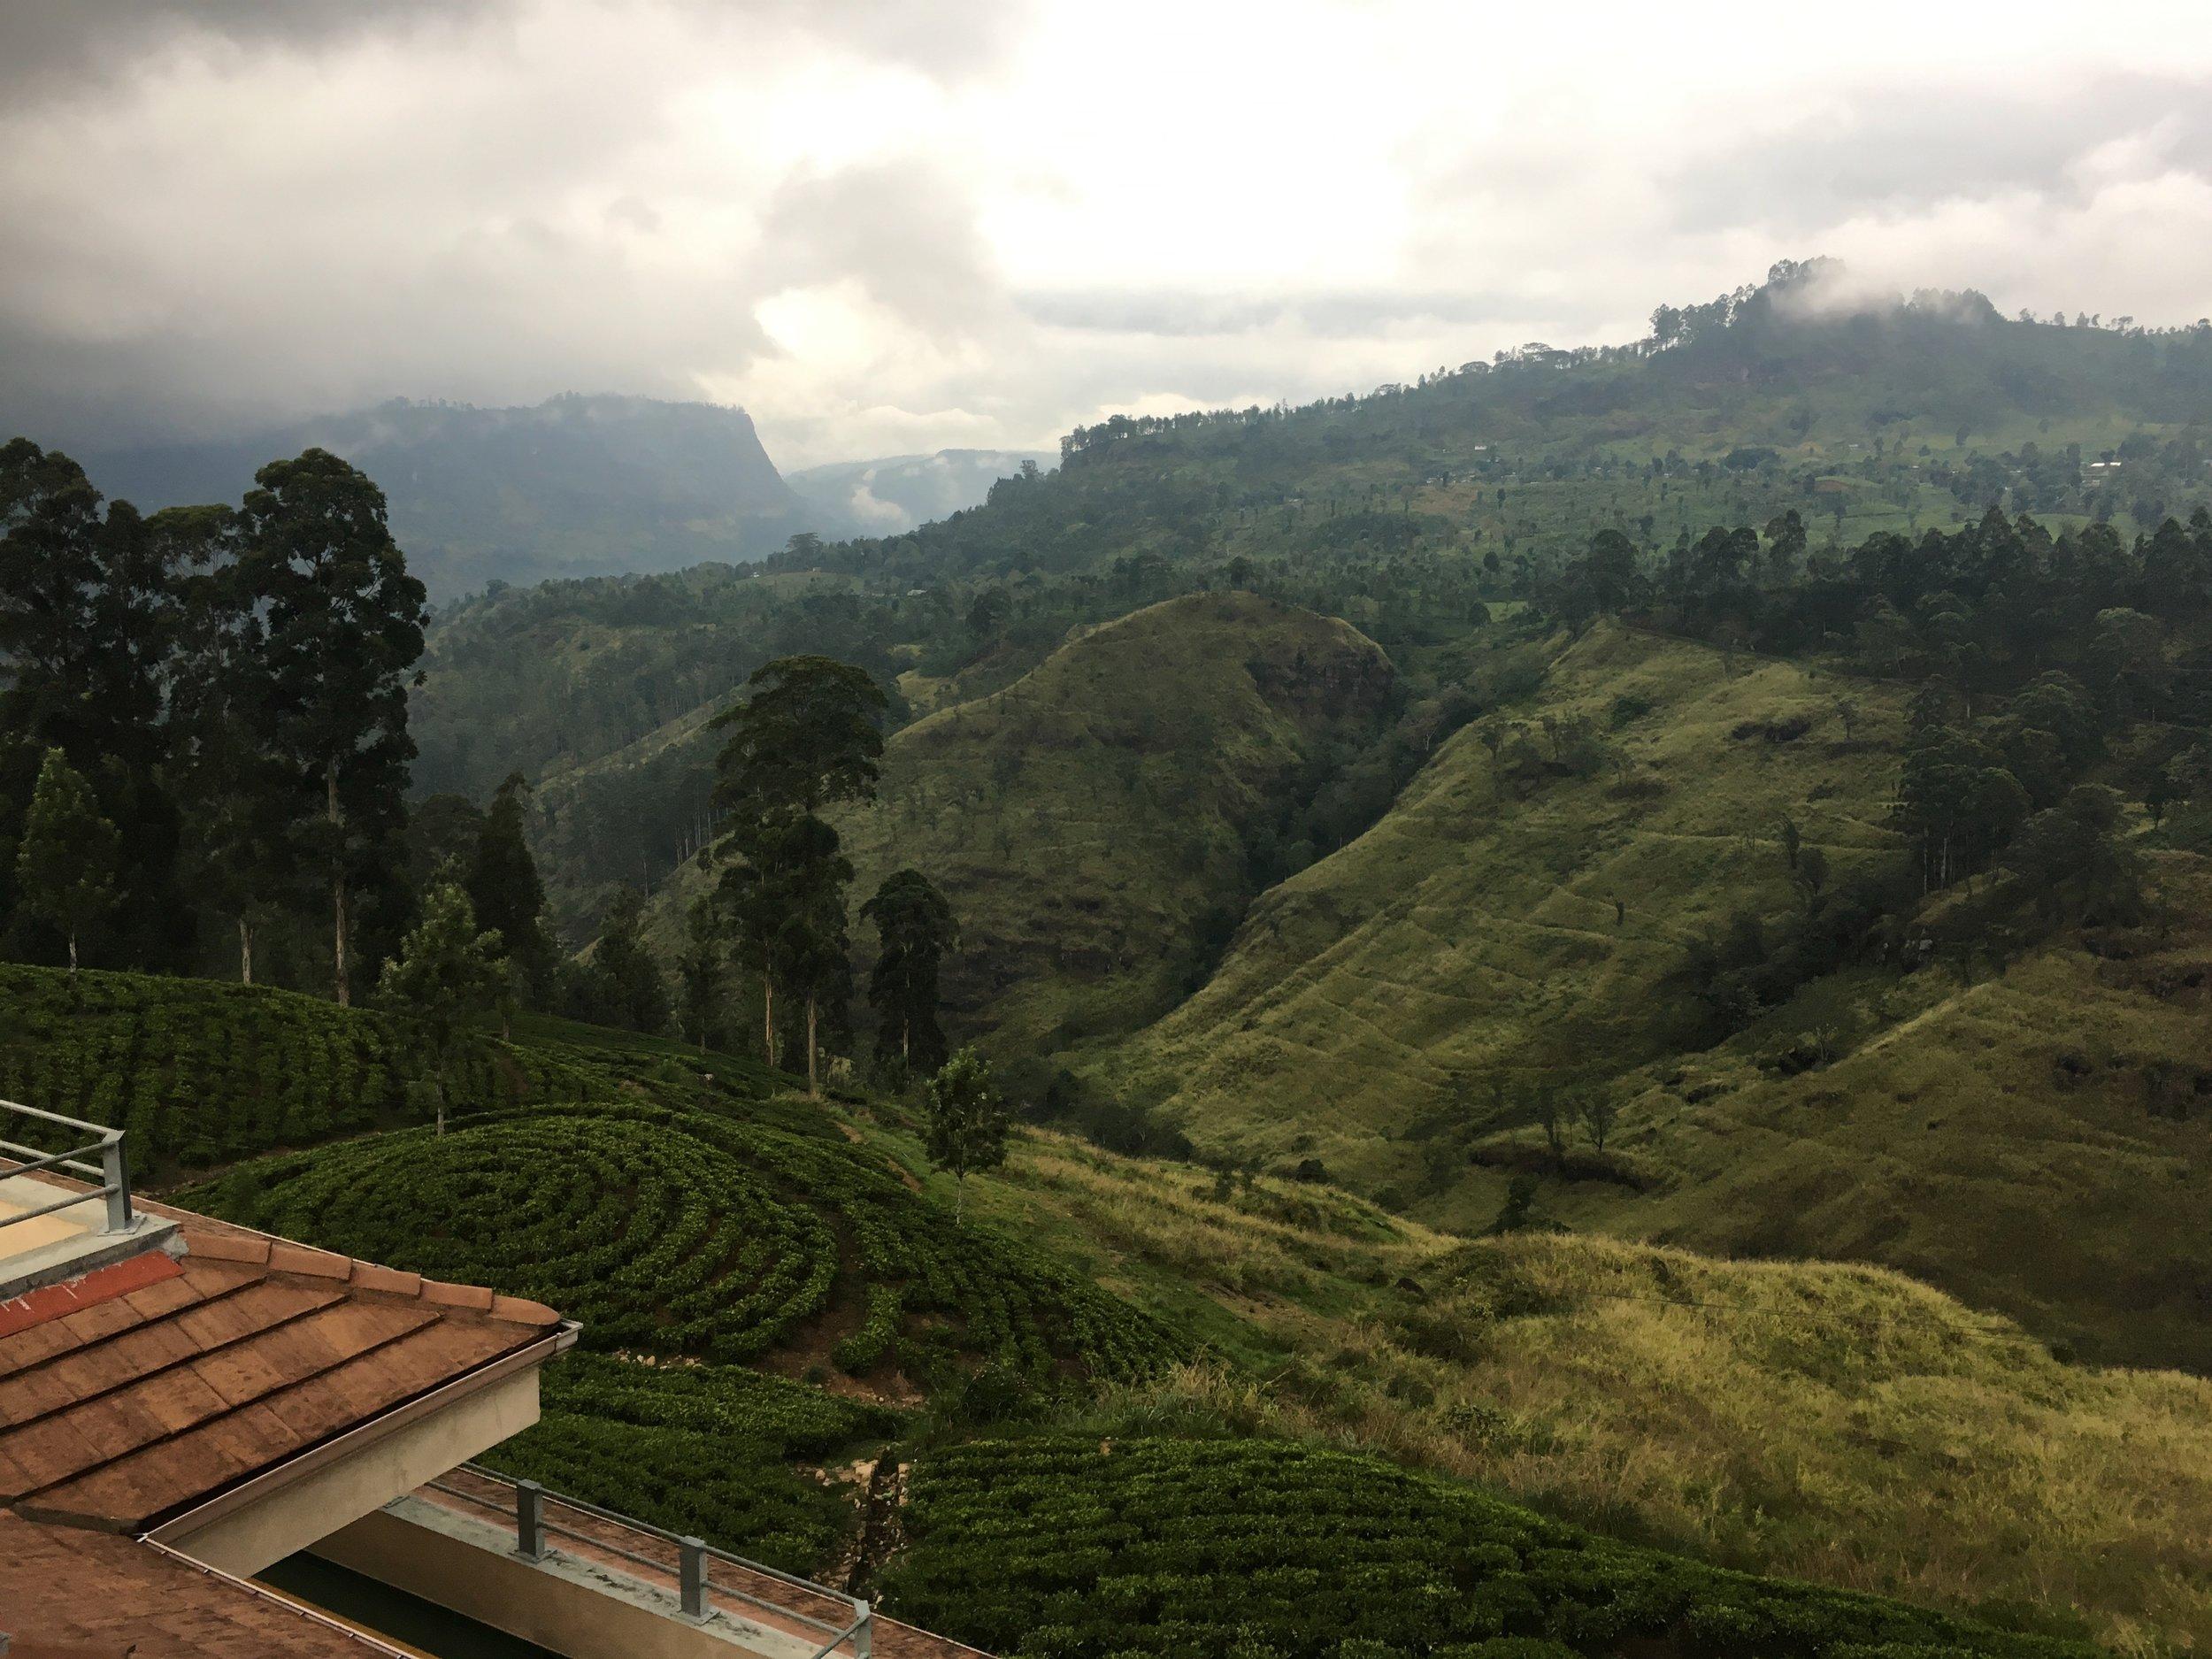 Sri Lanka's highlands - what a beauty